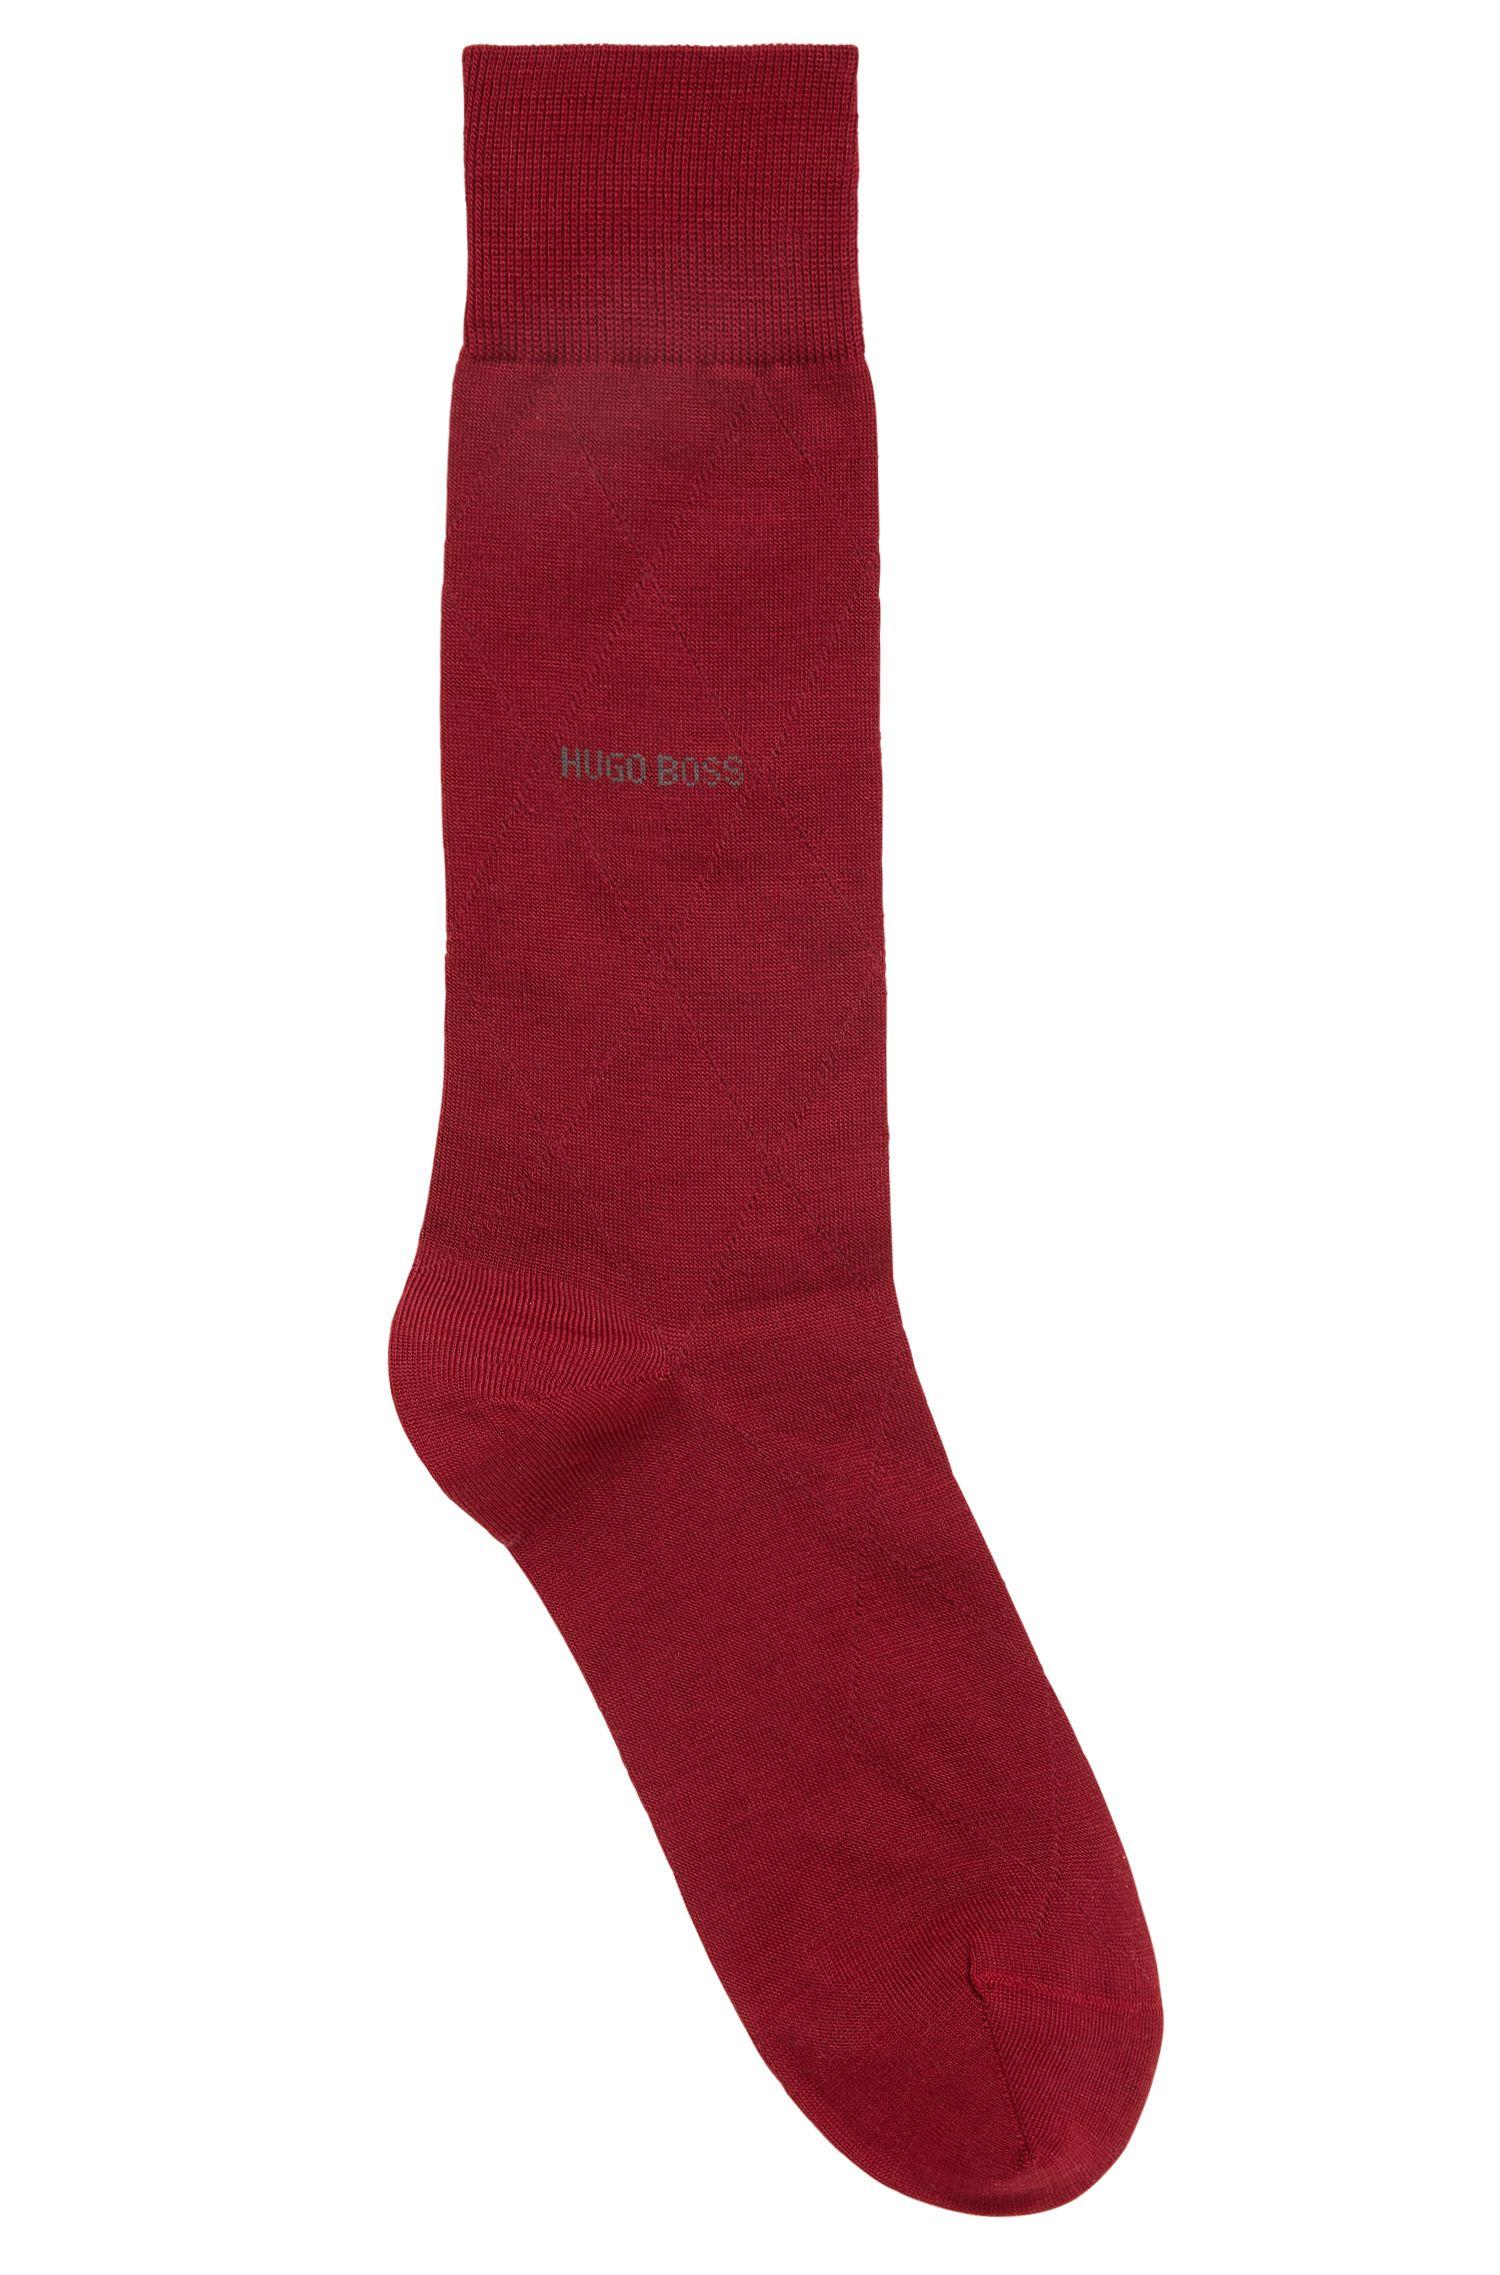 Lightweight socks in a stretch wool blend